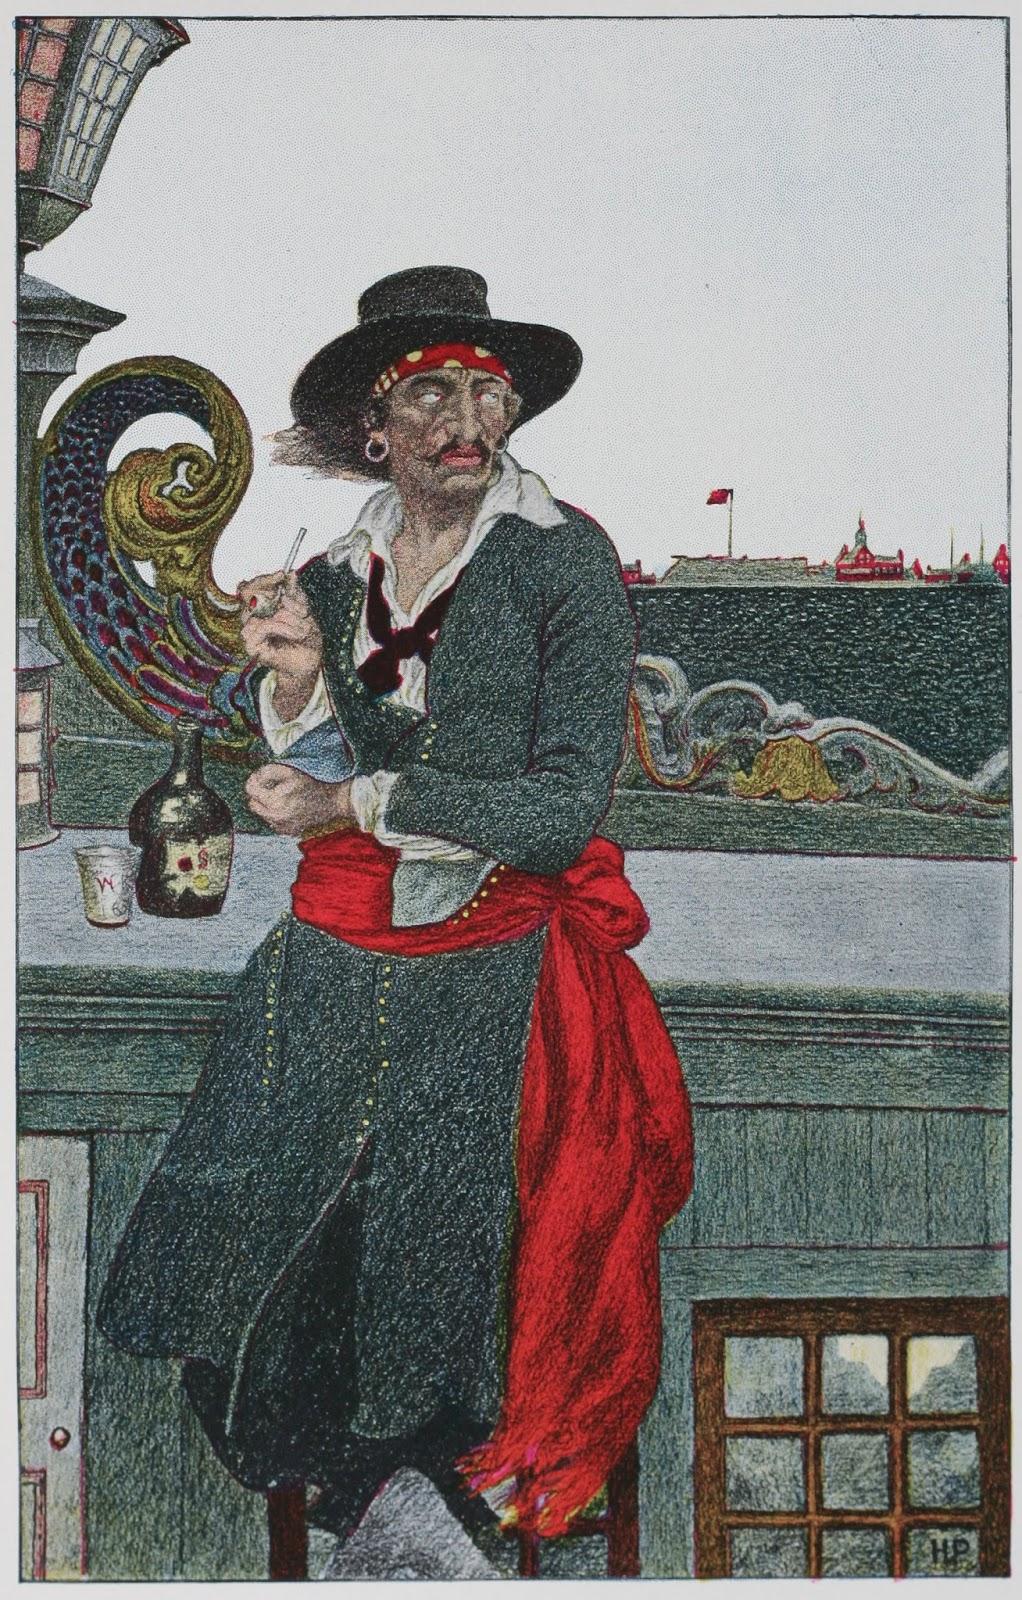 William Kidd, Captain Kidd